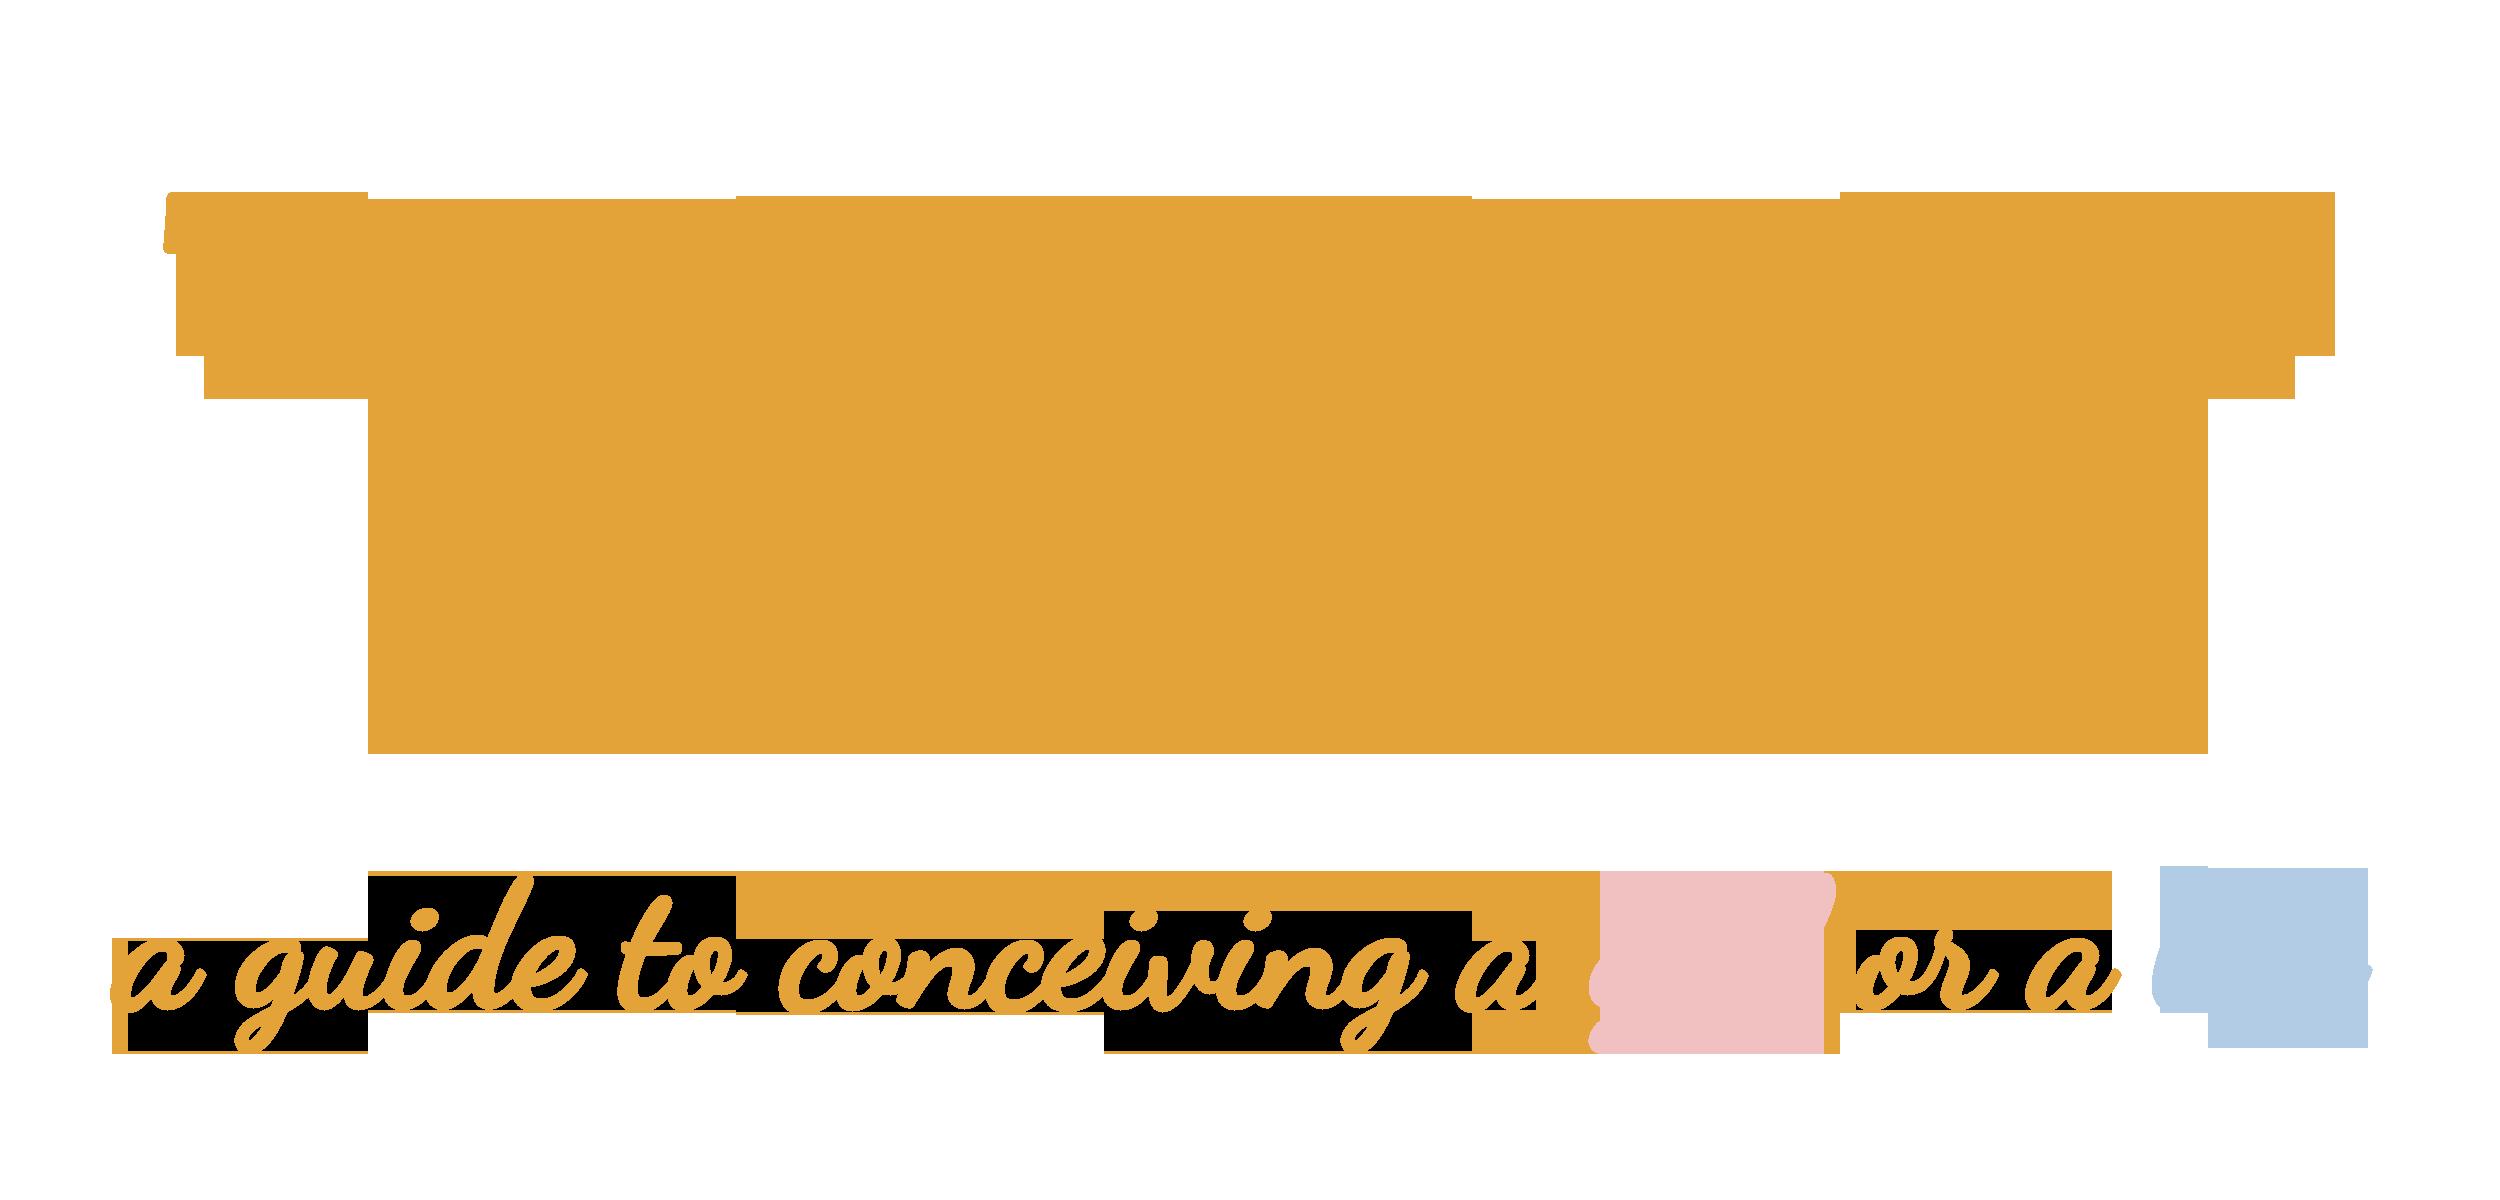 Babydustmethod